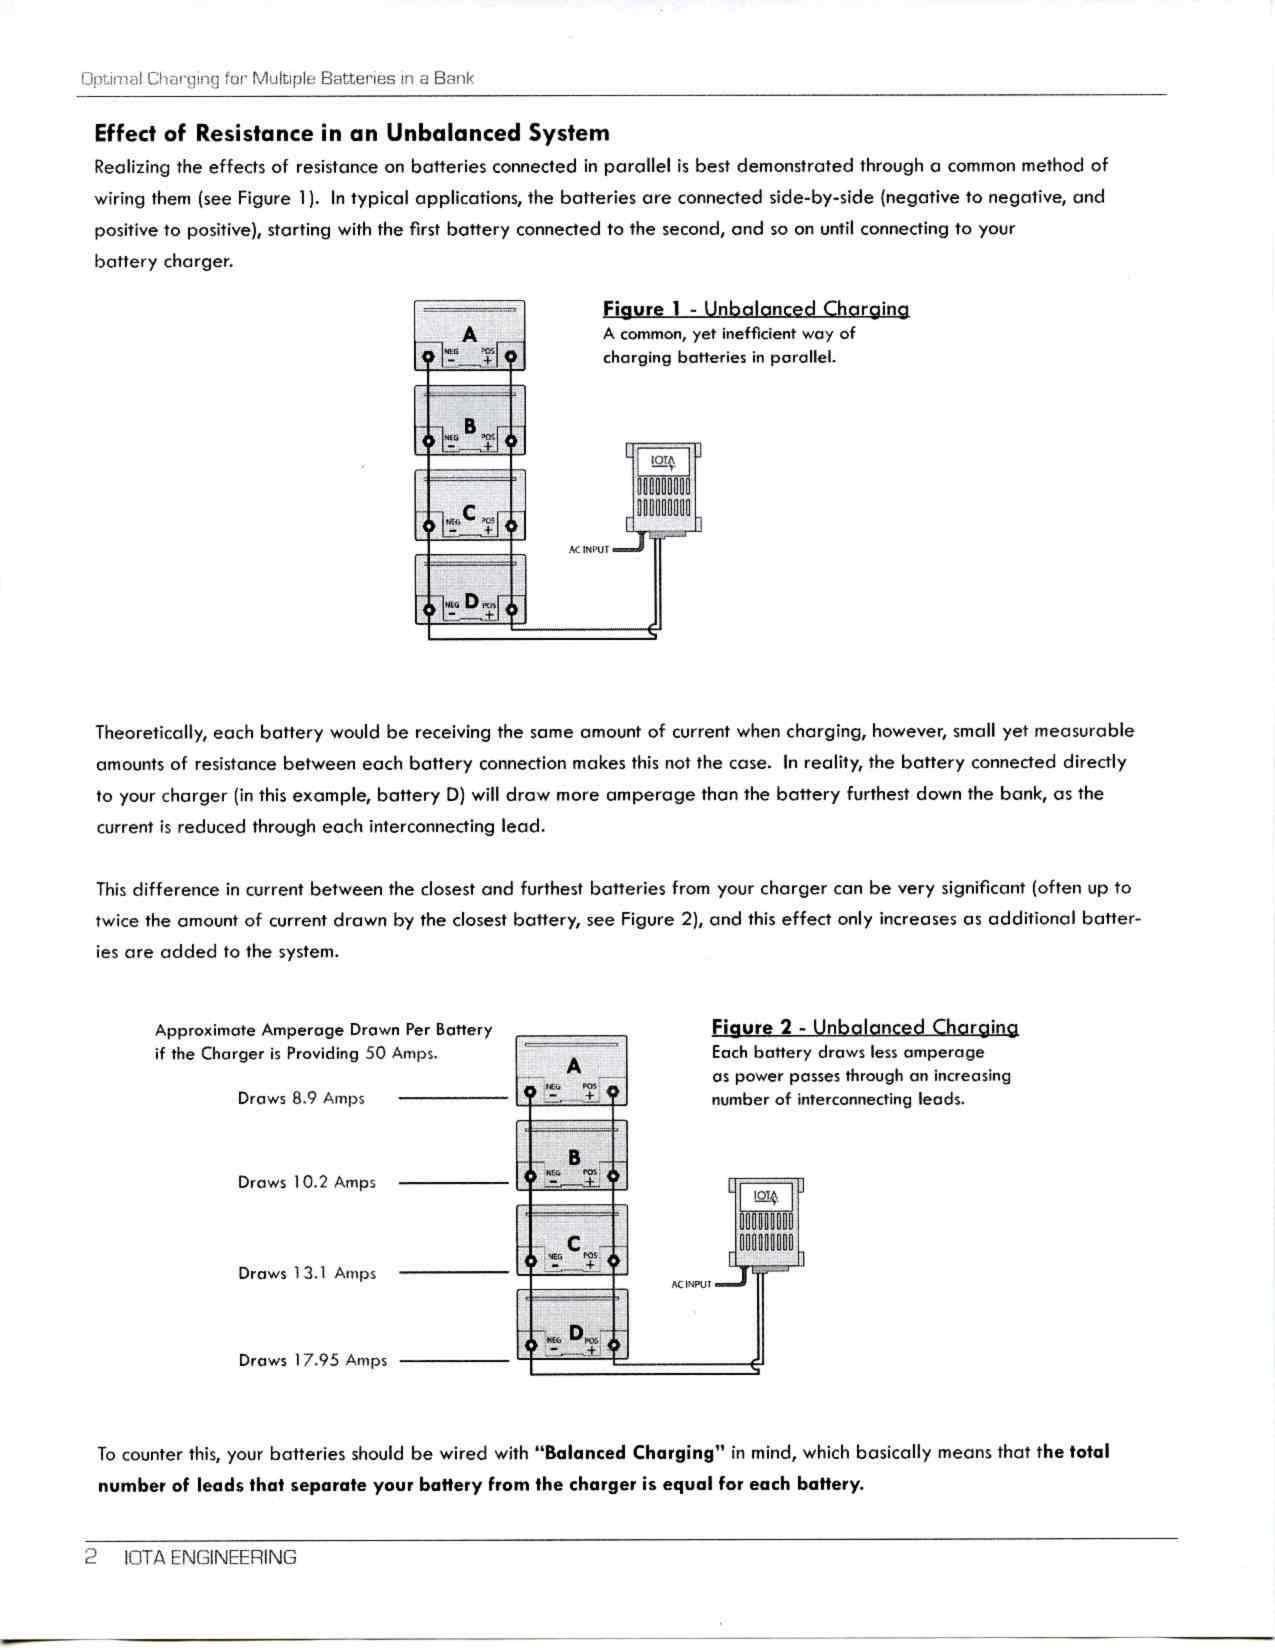 445bfb720?resize\\\=665%2C861 iota emergency ballast wiring diagram 1 lamp gandul 45 77 79 119  at nearapp.co